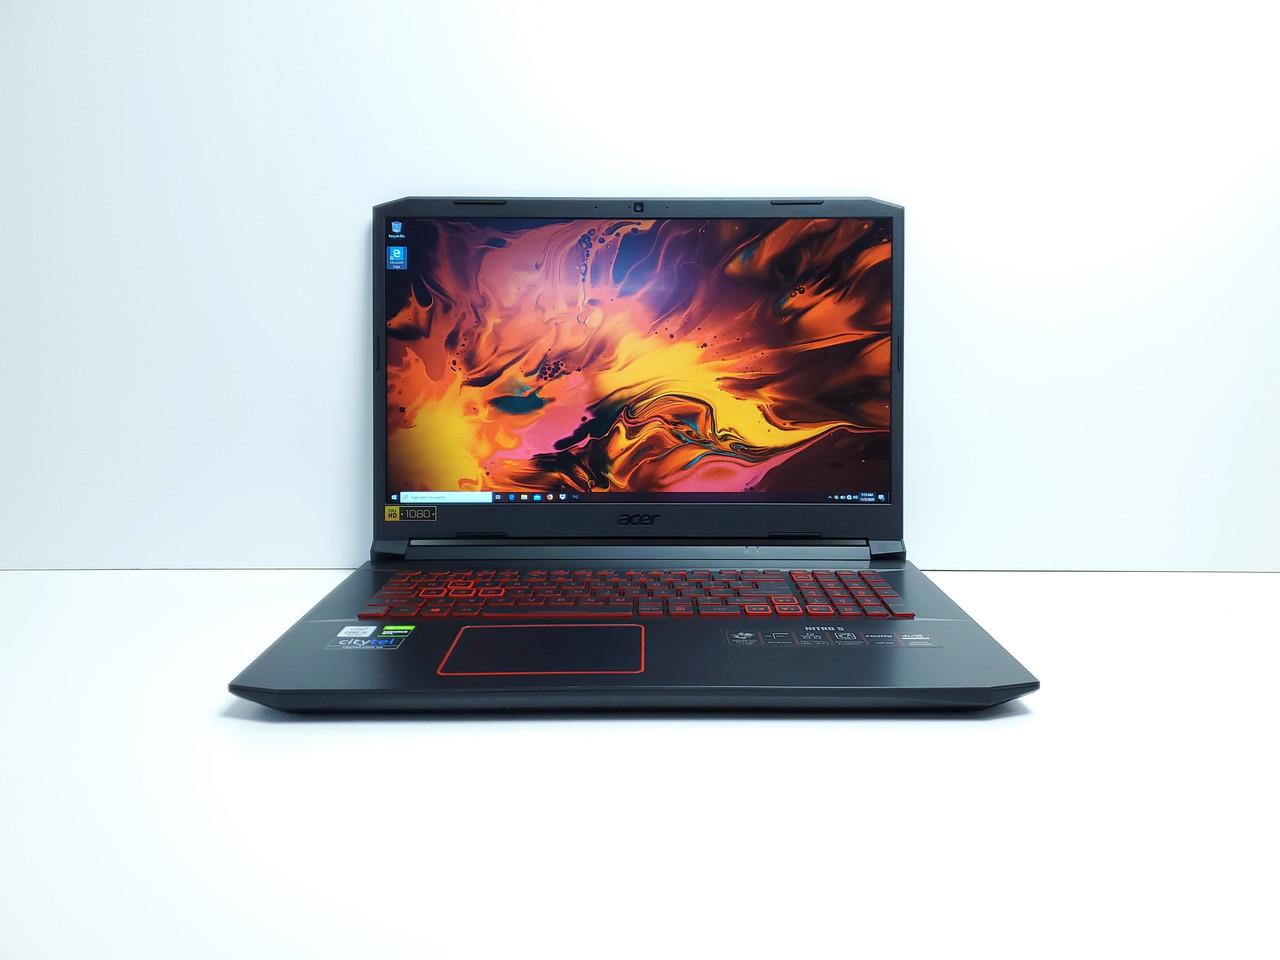 "Ігровий ноутбук Acer Nitro 5 17.3"" FHD i5-10300H 8Gb SSD512Gb GTX1650Ti 4GB GDDR6 Windows 10"